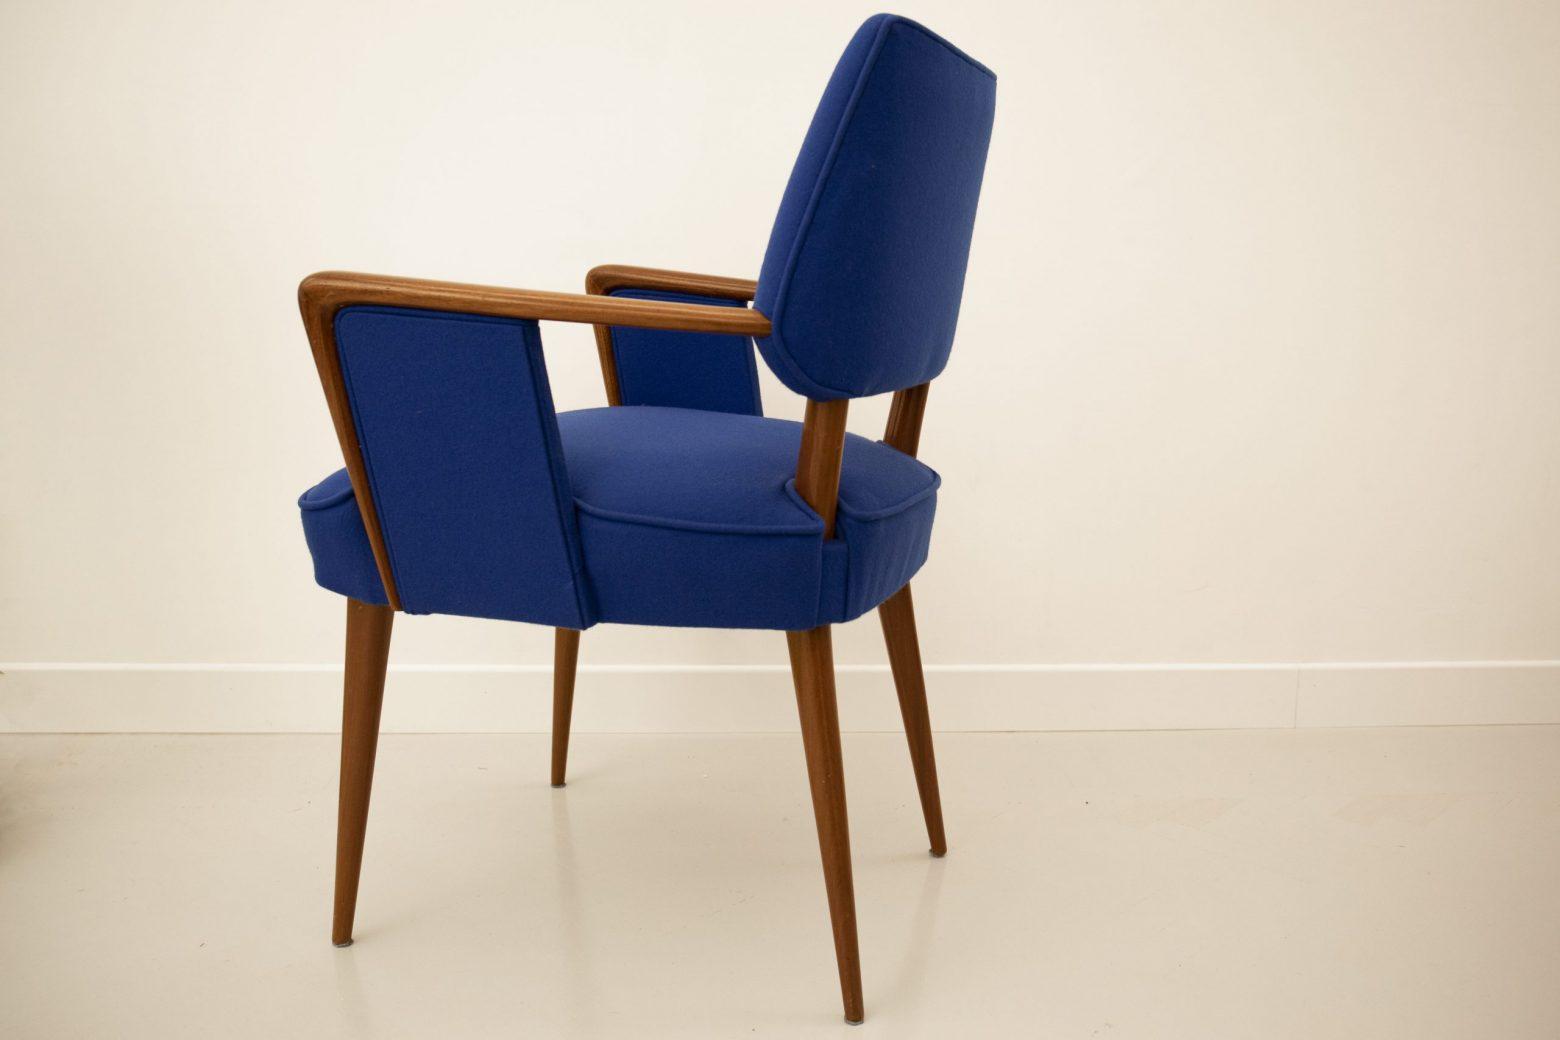 Sedia blu particolare